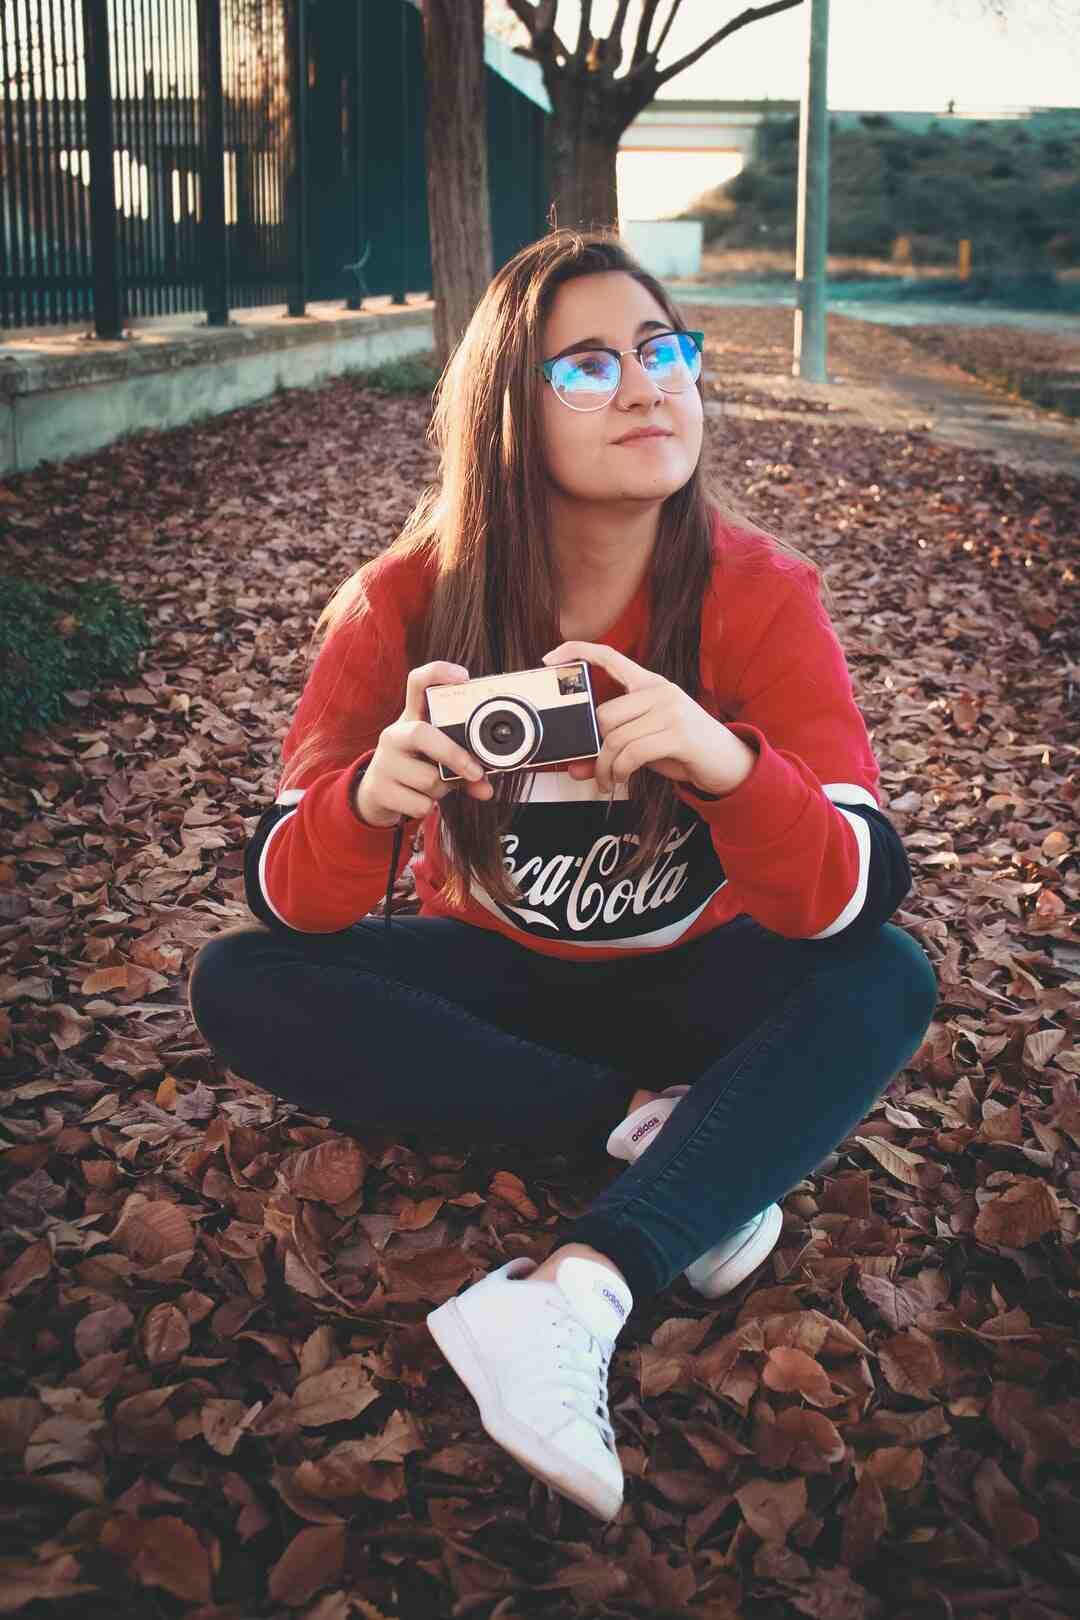 Comment developper photo